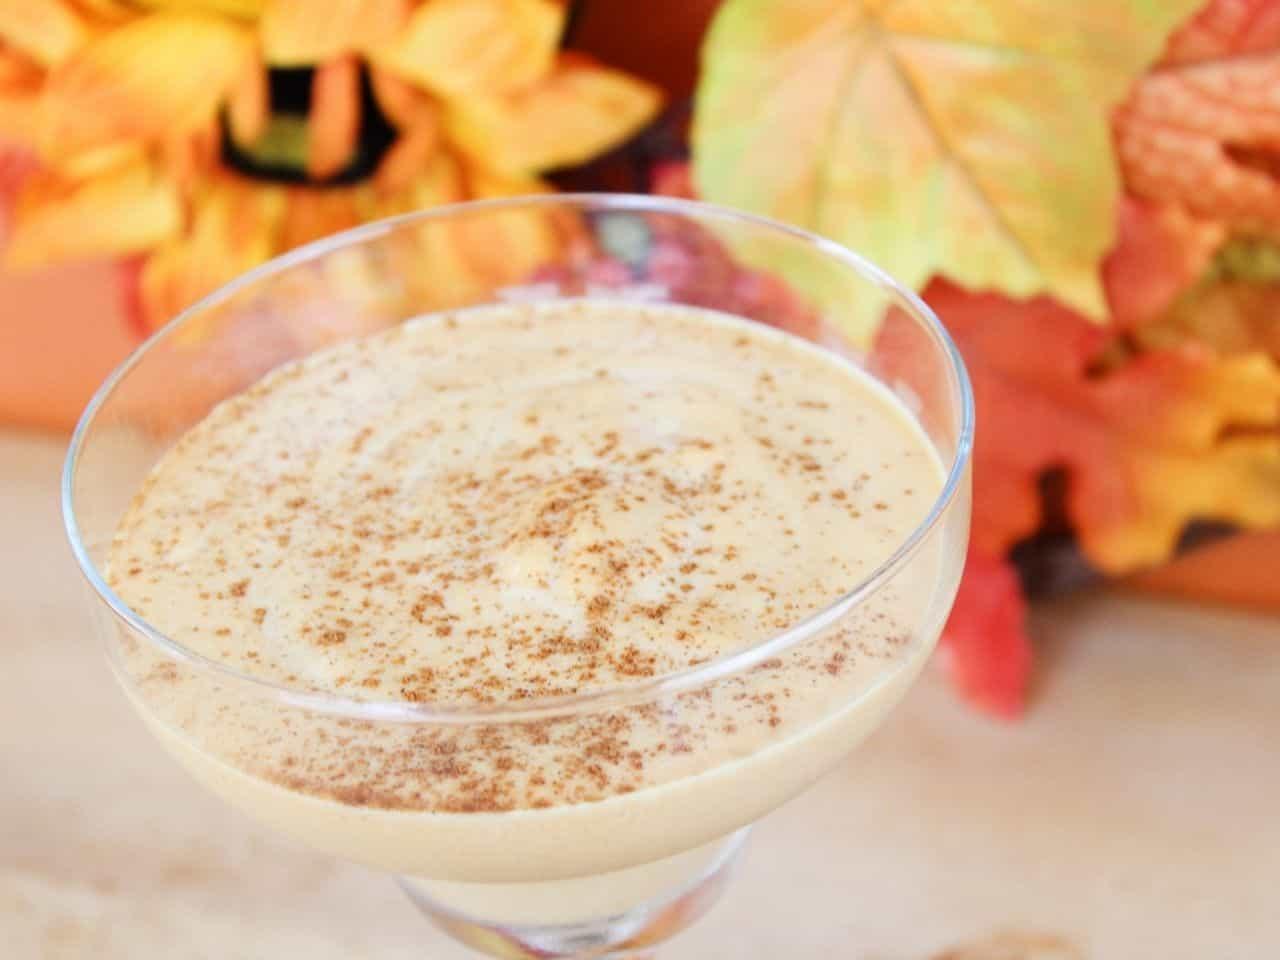 Pumpkin cocktail milkshake in a glass with leaves behind it